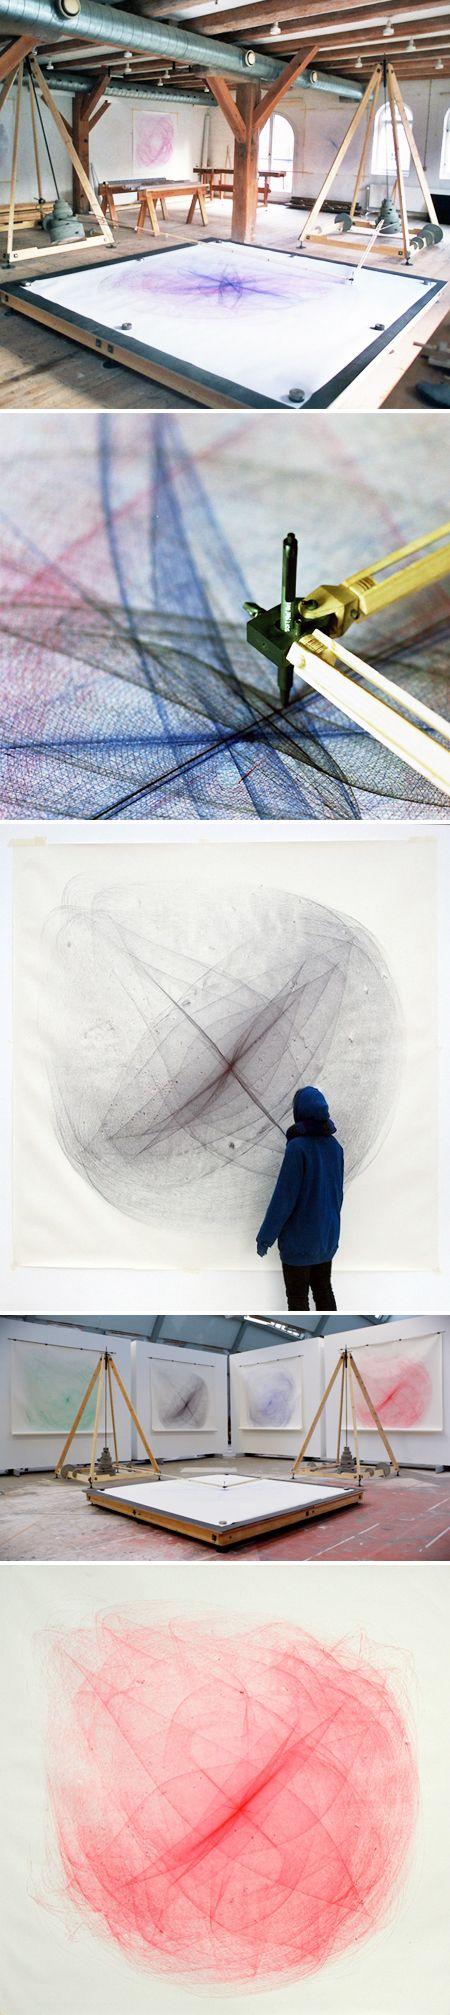 'drawing machine' by eske rex